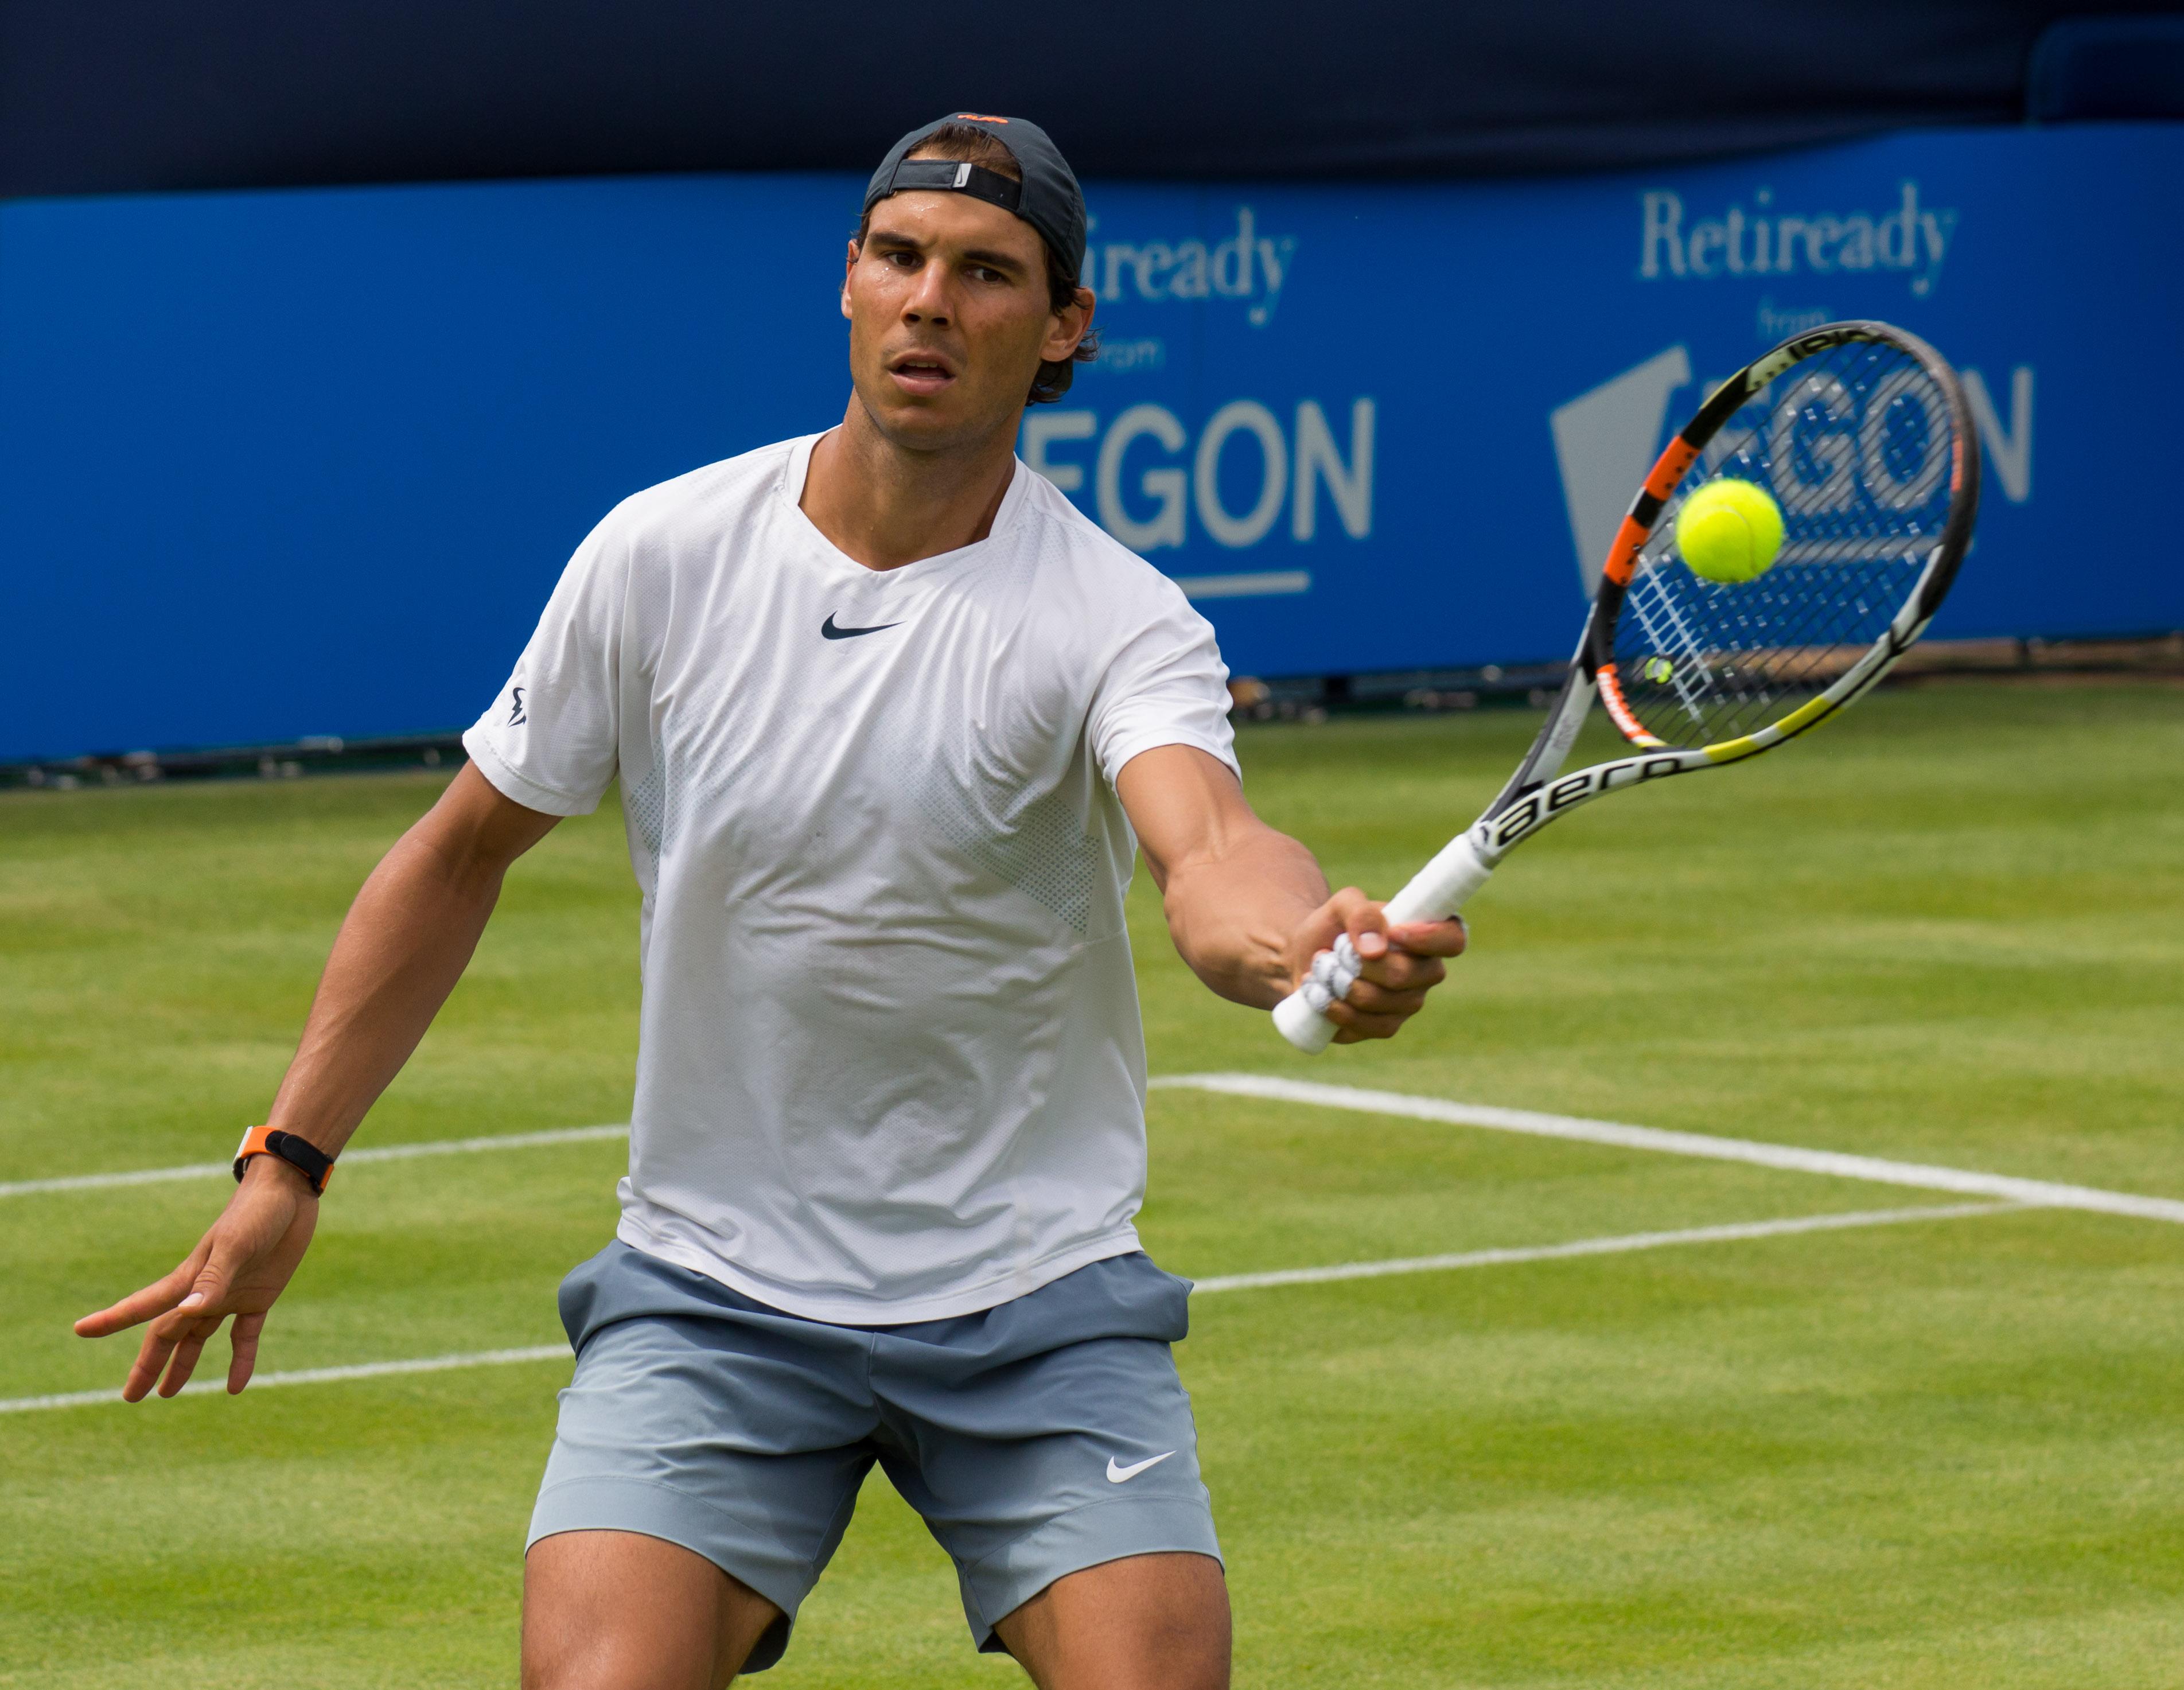 Nadal Wikipedia: File:Rafael Nadal 7, Aegon Championships, London, UK